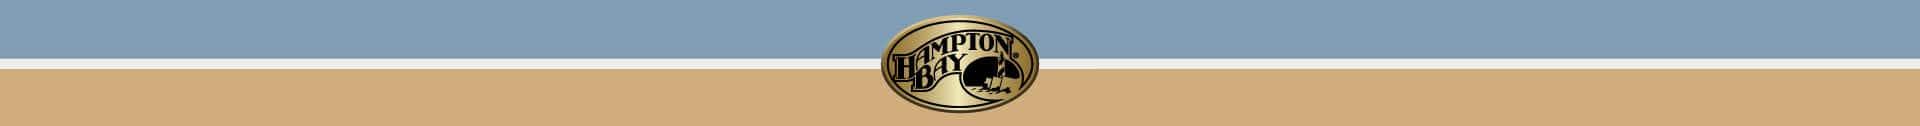 Hampton Bay logo banner